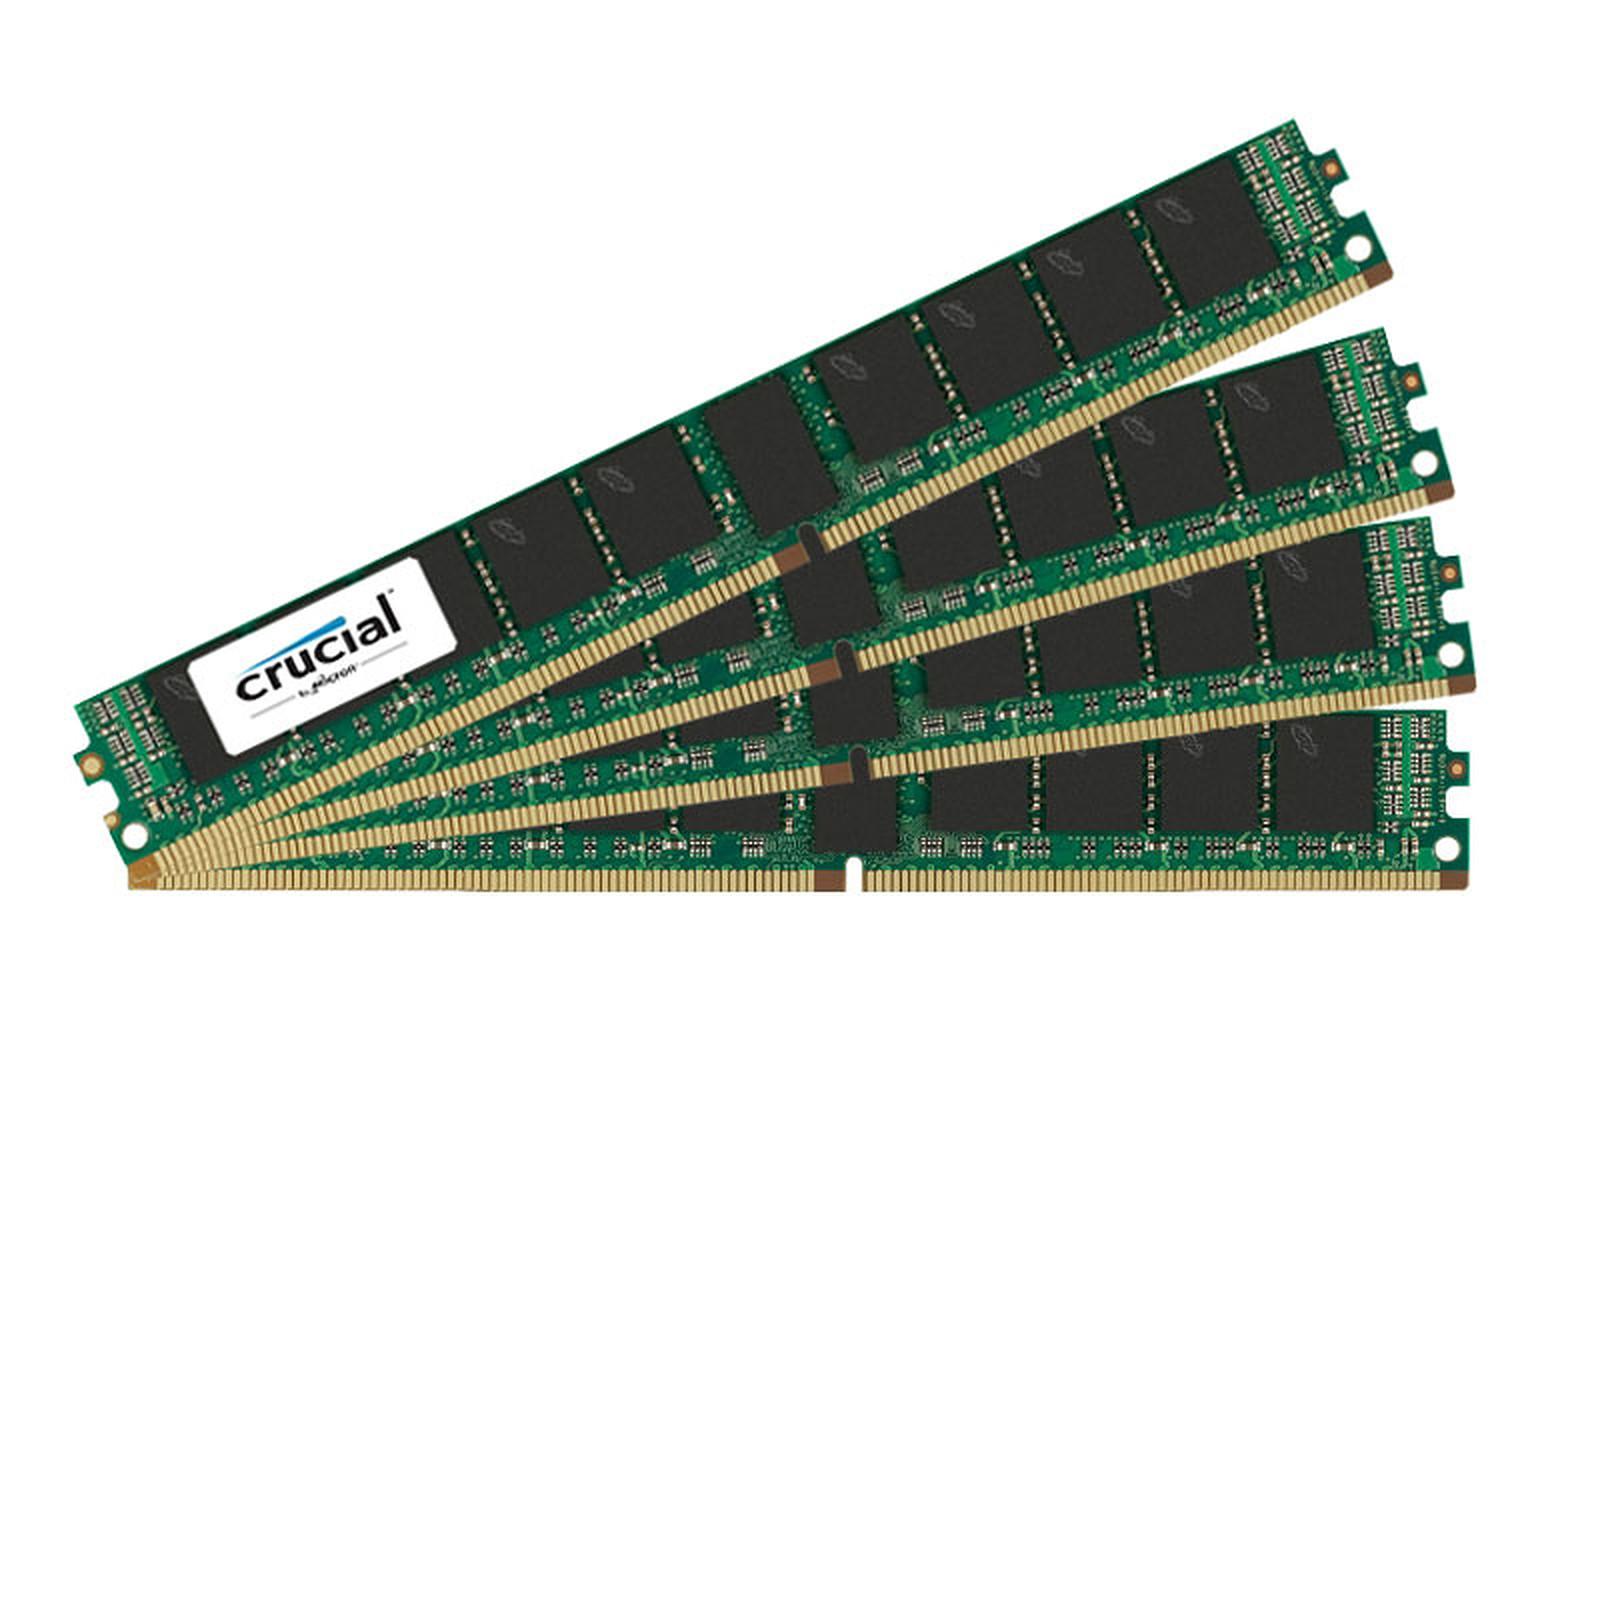 Crucial DDR4 32 Go (4 x 8 Go) 2133 MHz CL15 ECC Registered SR X4 VLP